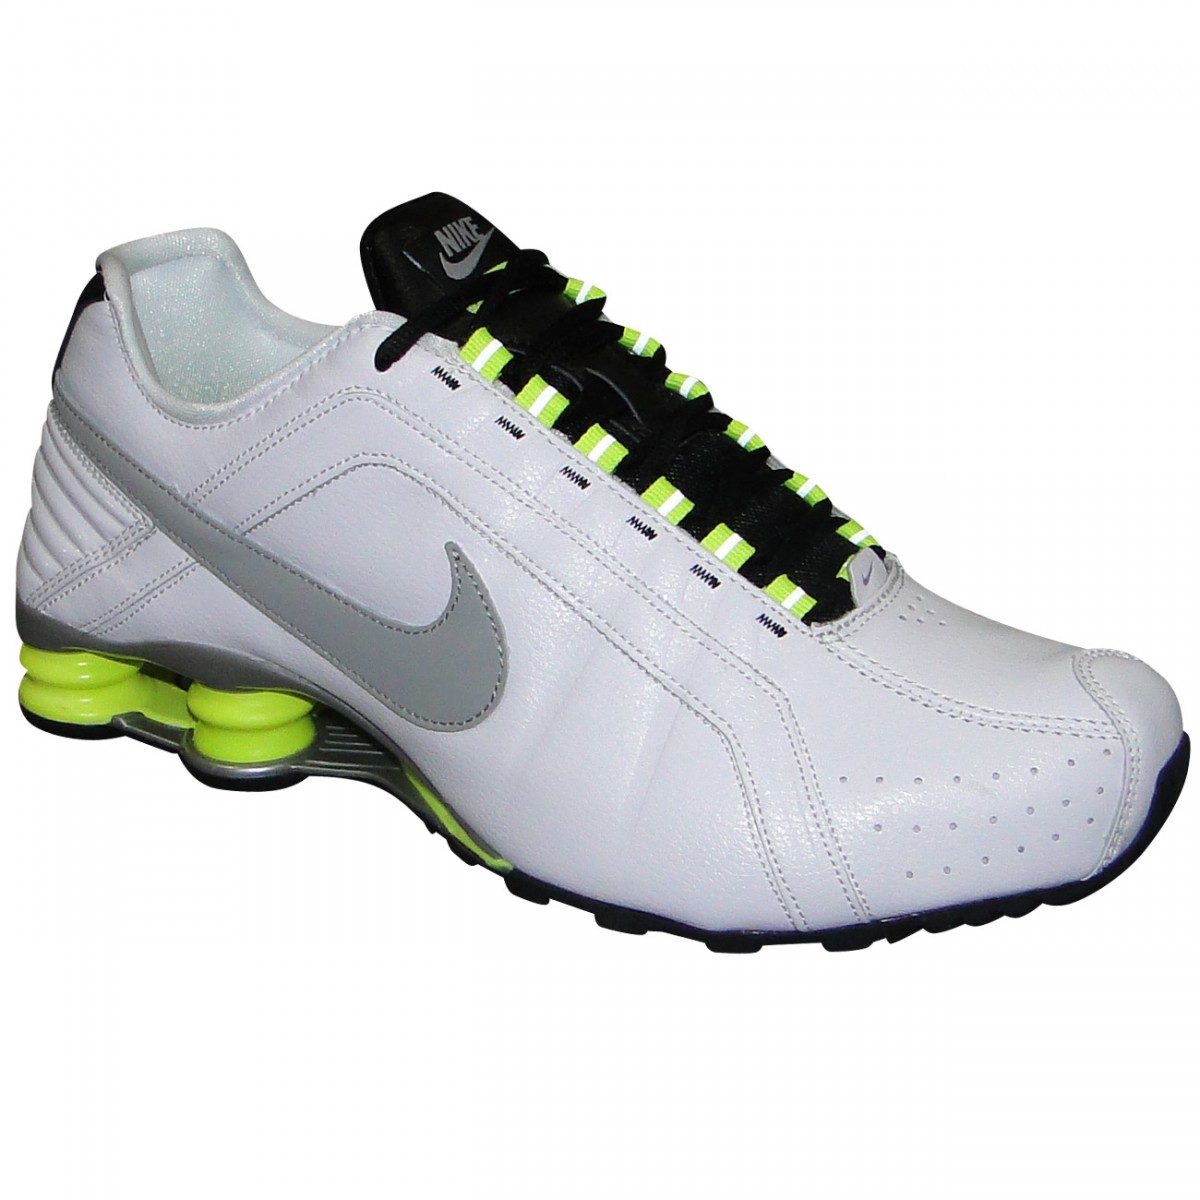 11b38845c64 Tenis Nike Shox Junior 454340 108 - Branco Cinza Limão - Chuteira ...